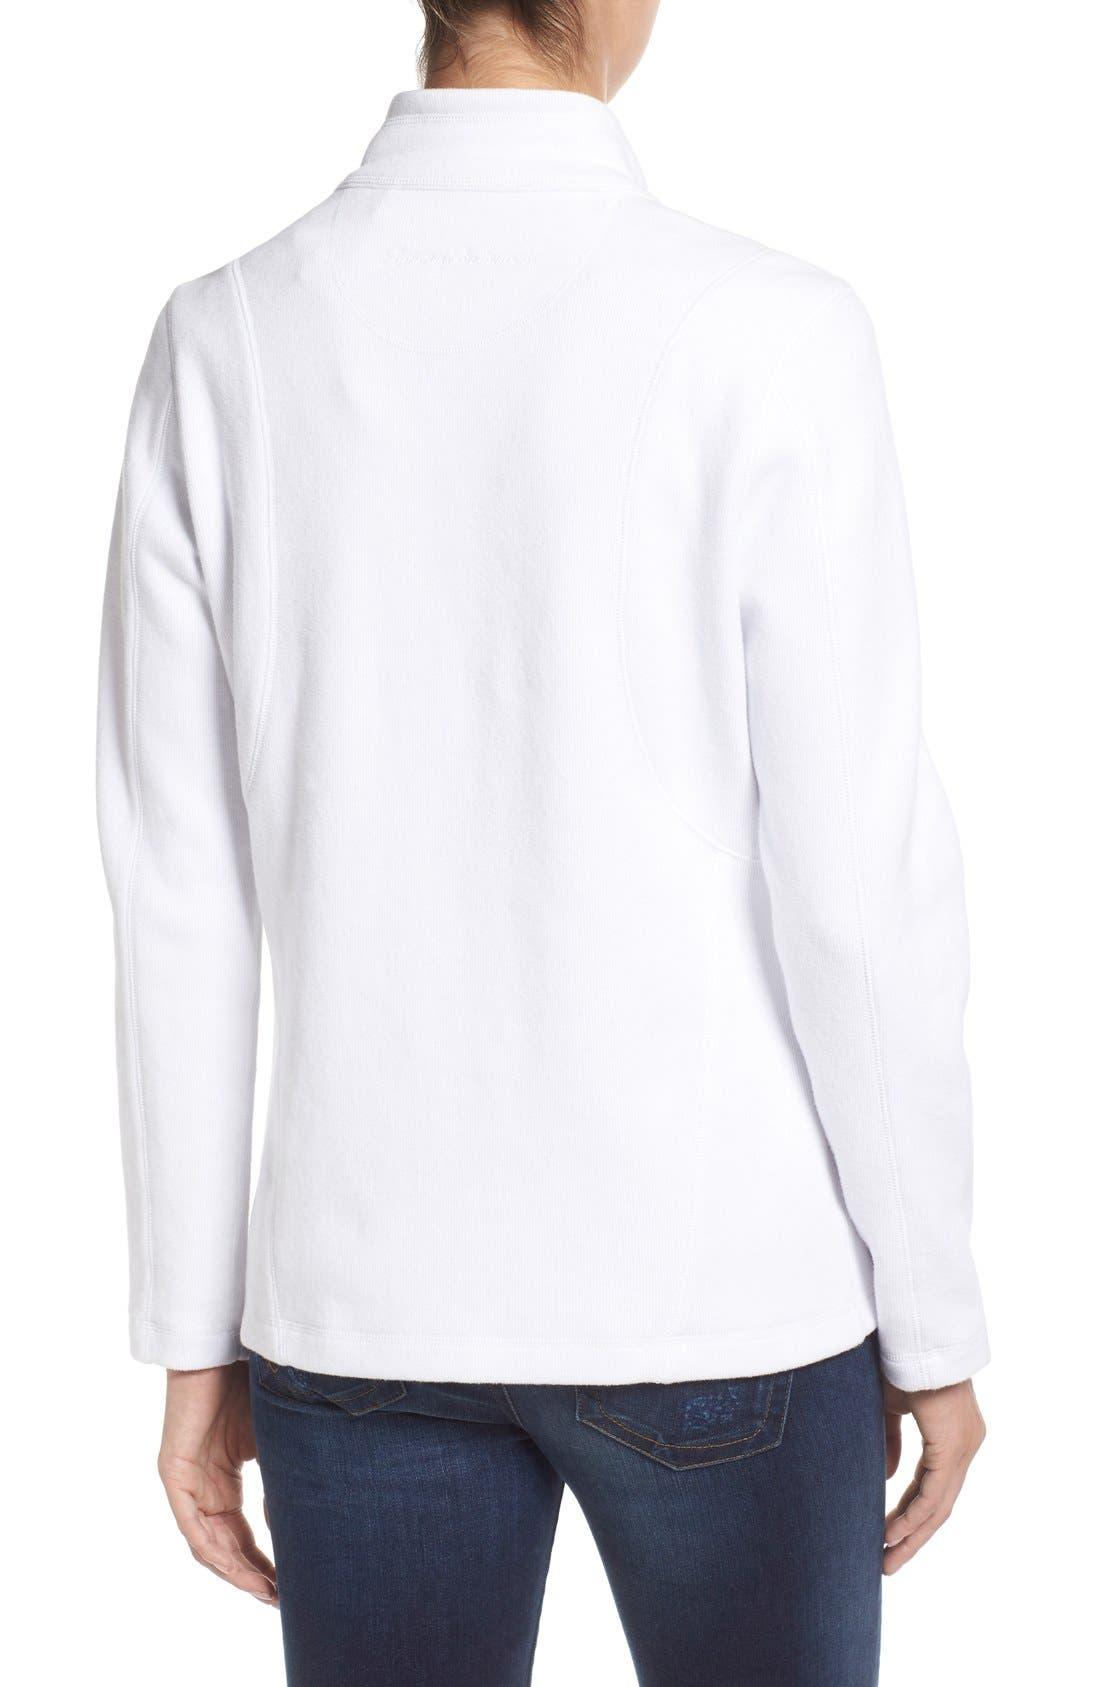 'Aruba' Full Zip Sweatshirt,                             Alternate thumbnail 34, color,